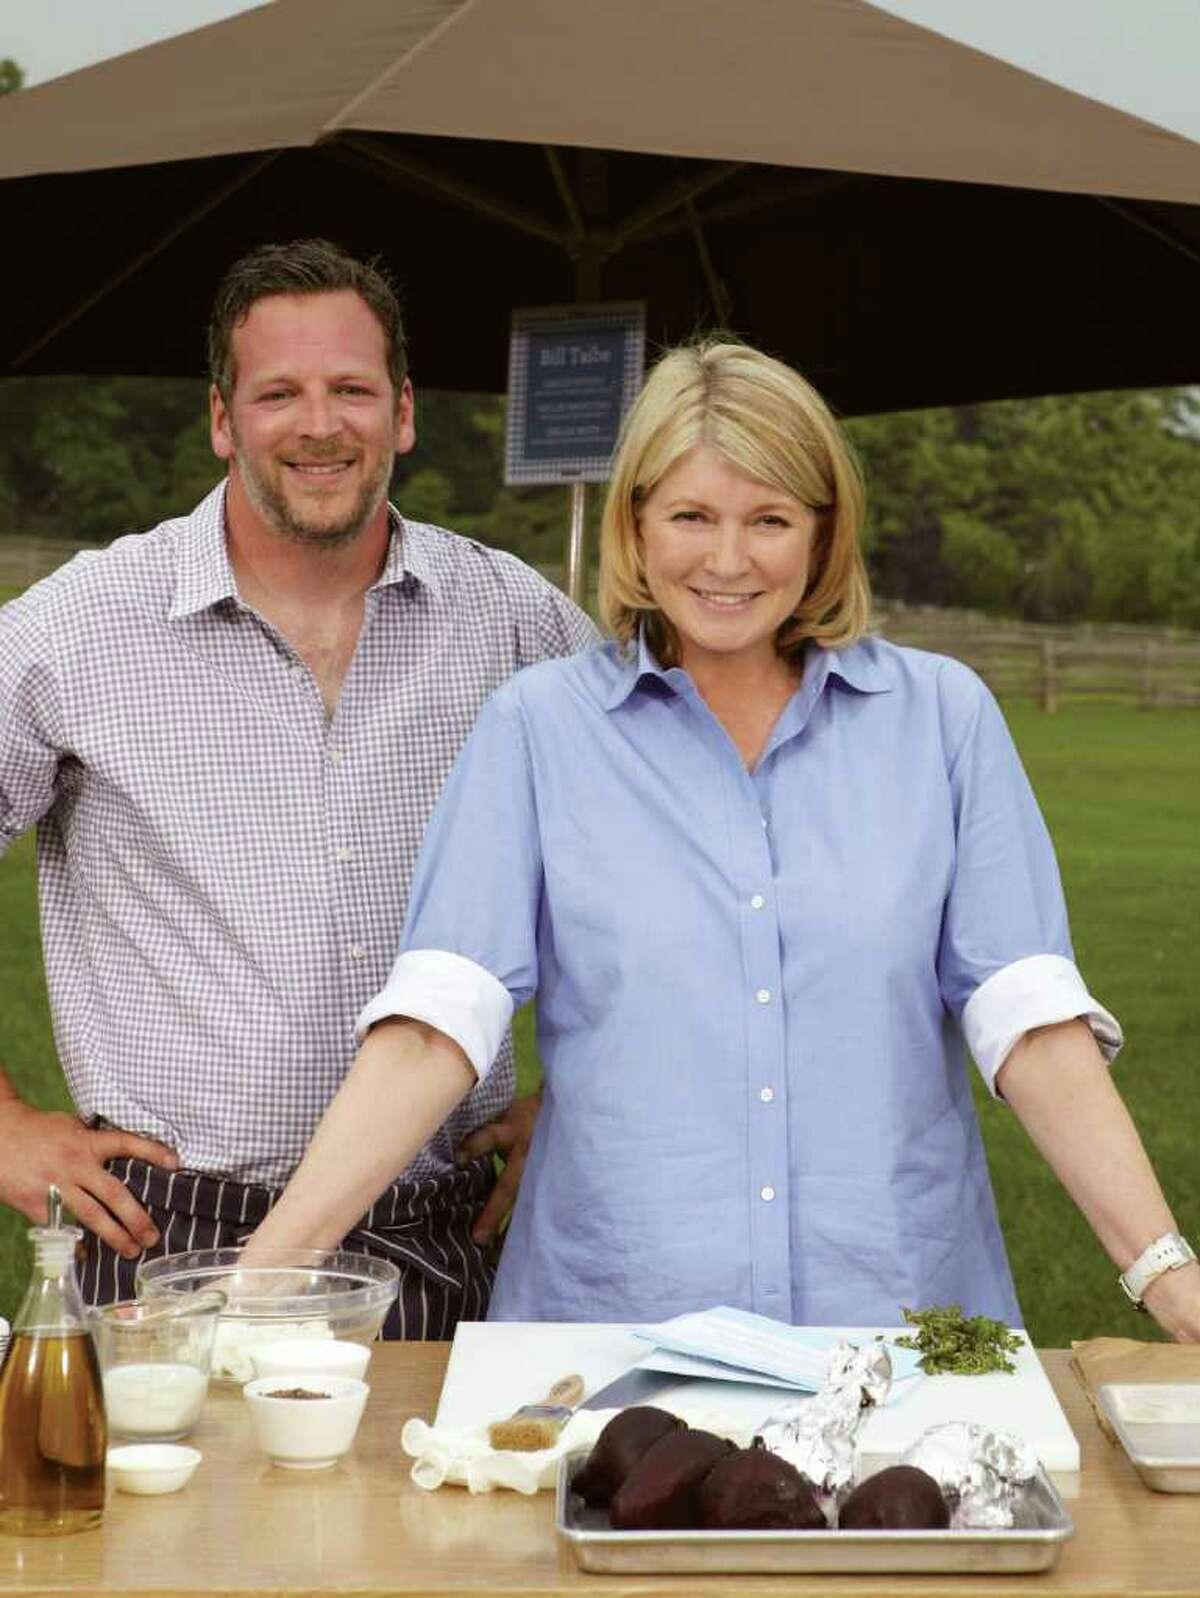 Bill Taibe, owner of Le Farm, with Martha Stewart